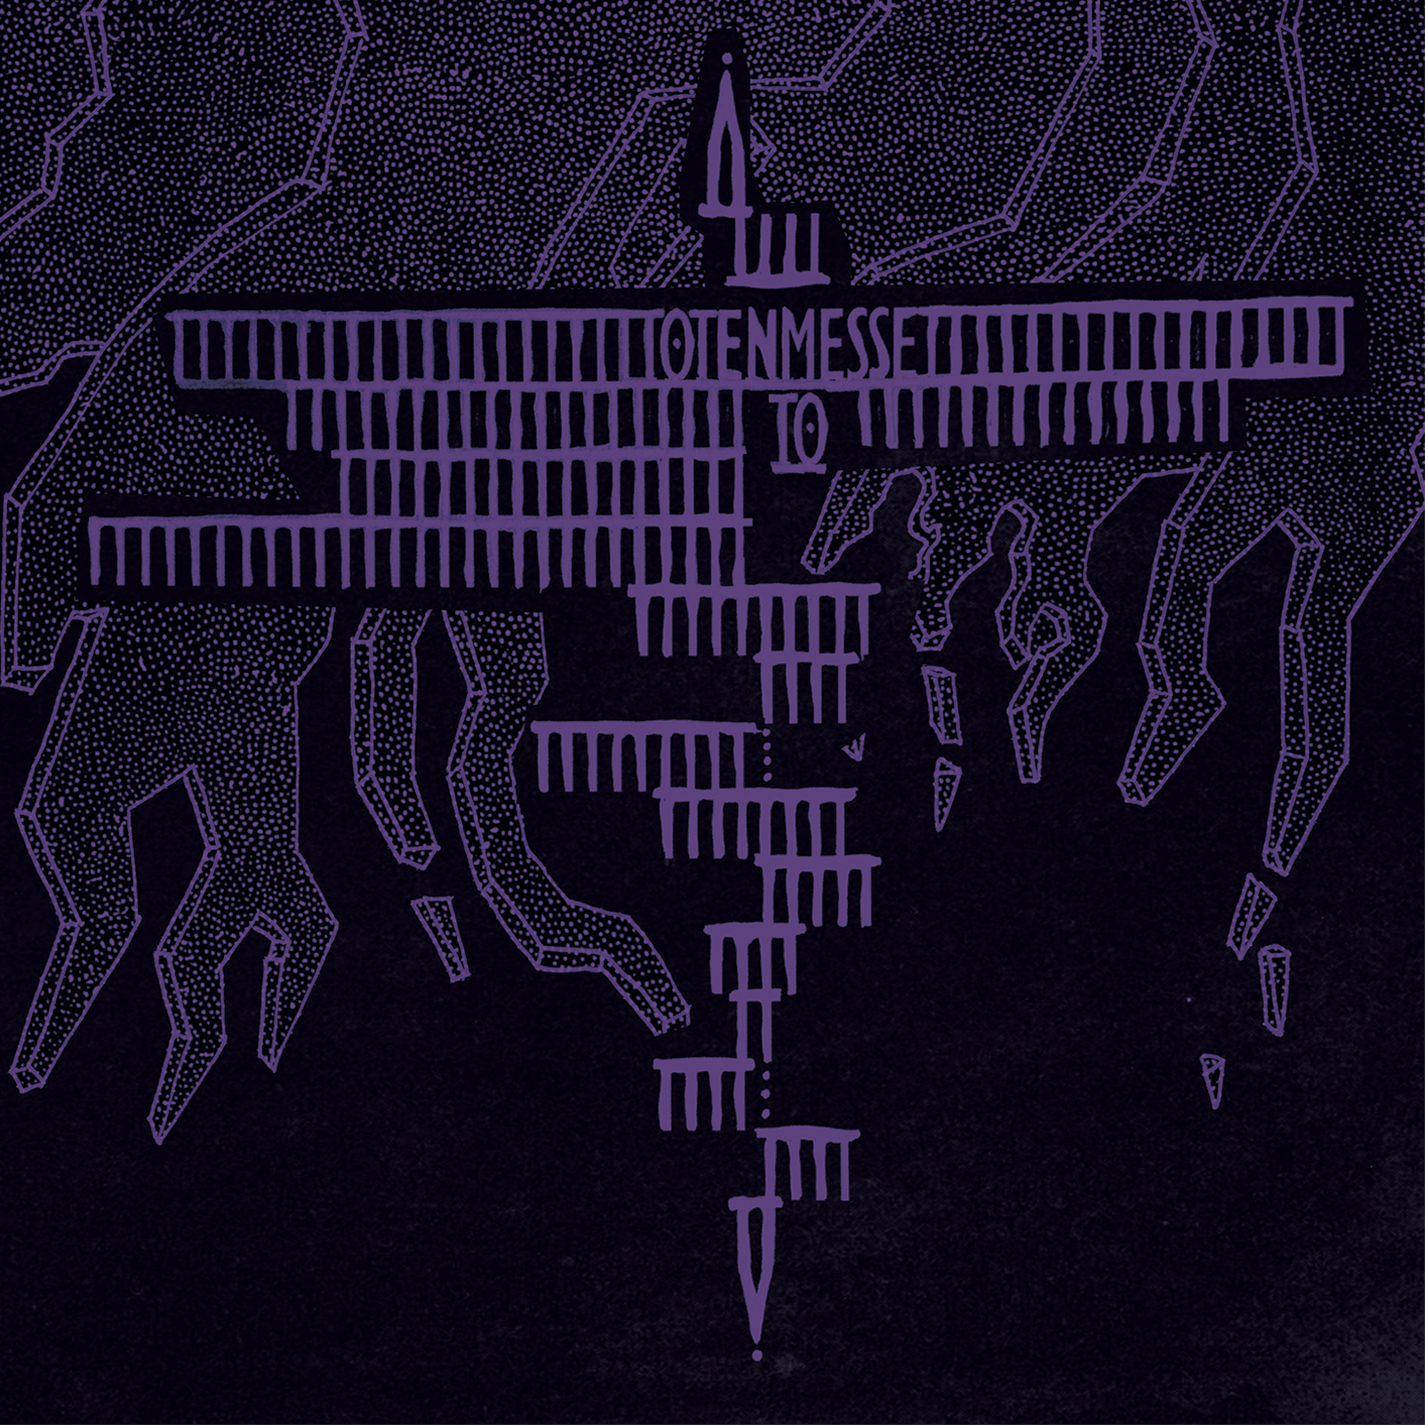 Totenmesse - To 01